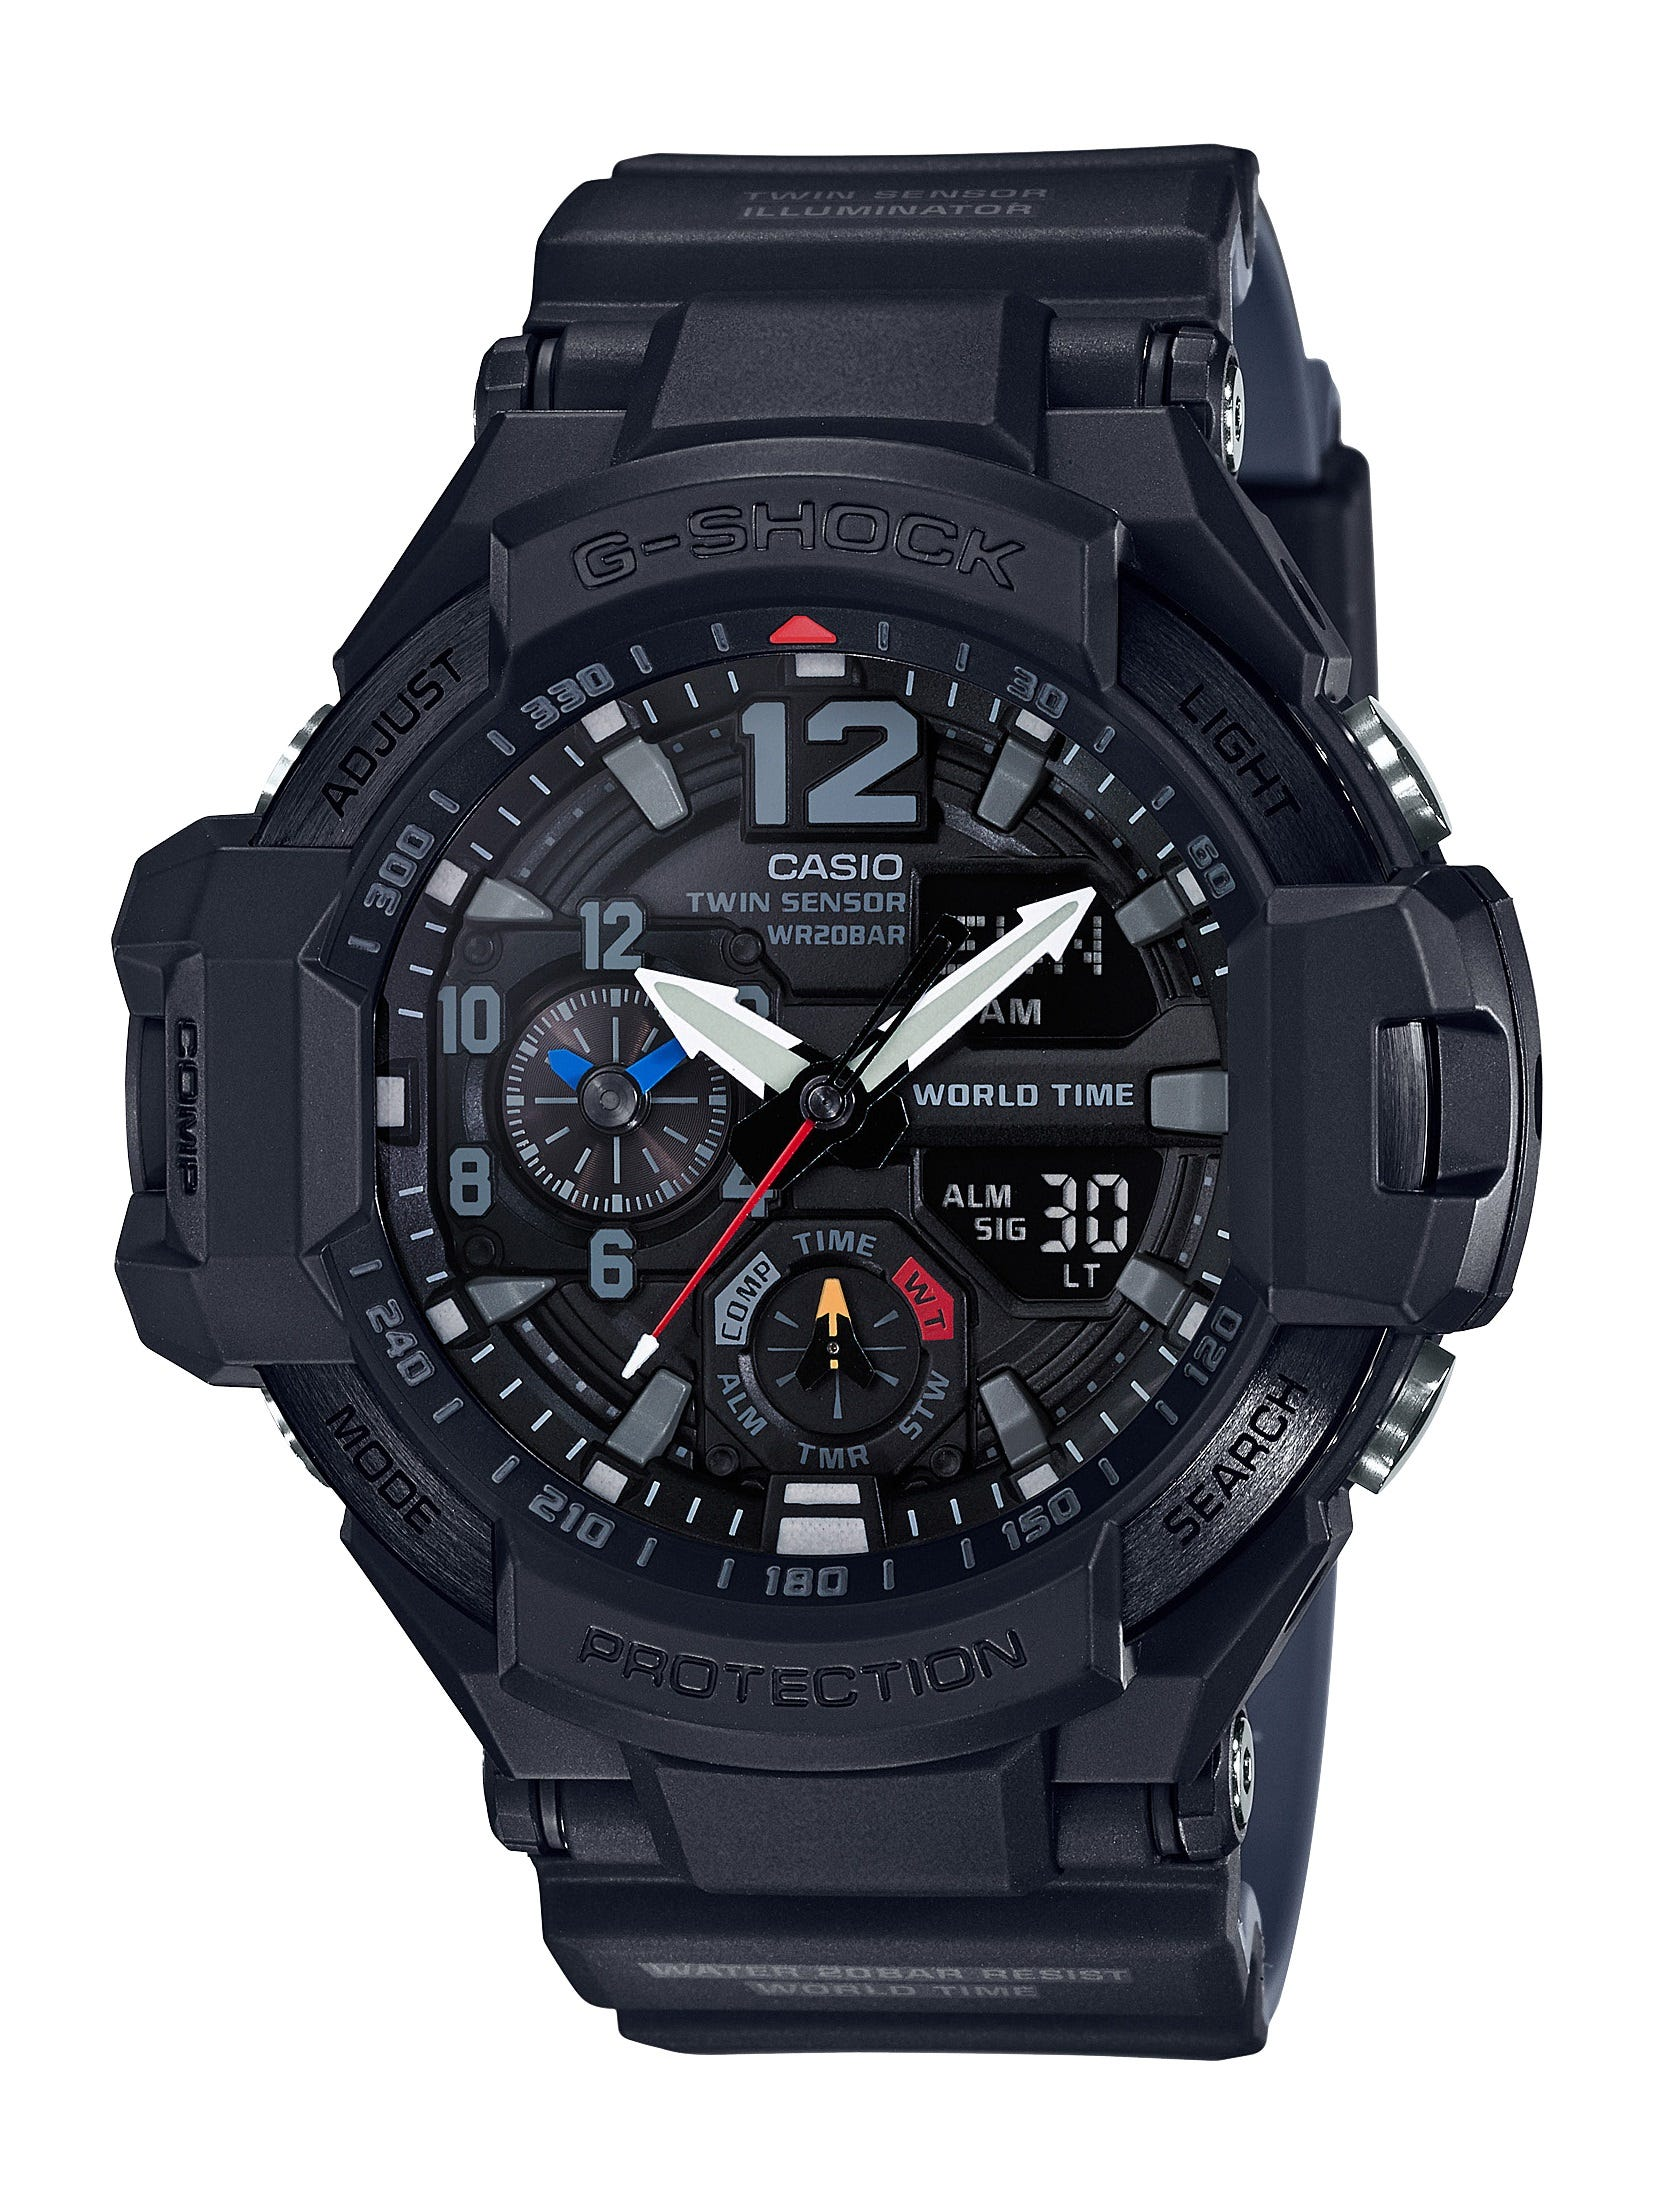 G-Shock Gravitymaster World Time Watch GA1100-1A1